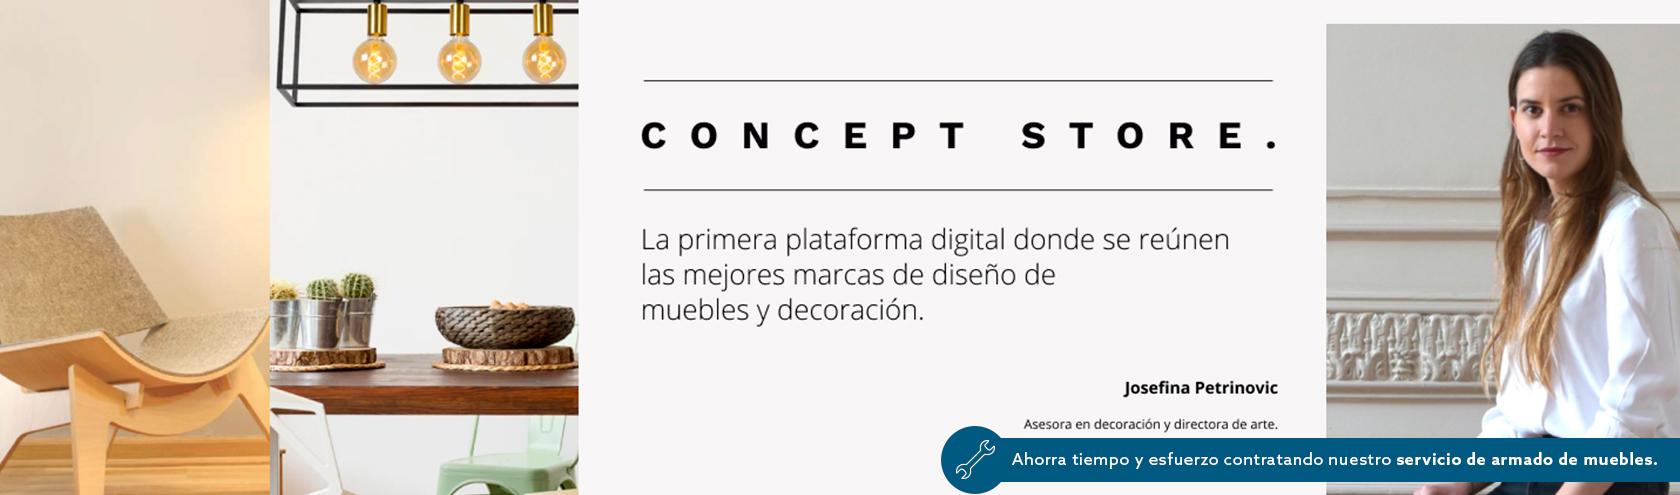 Especial Concept Store 2021